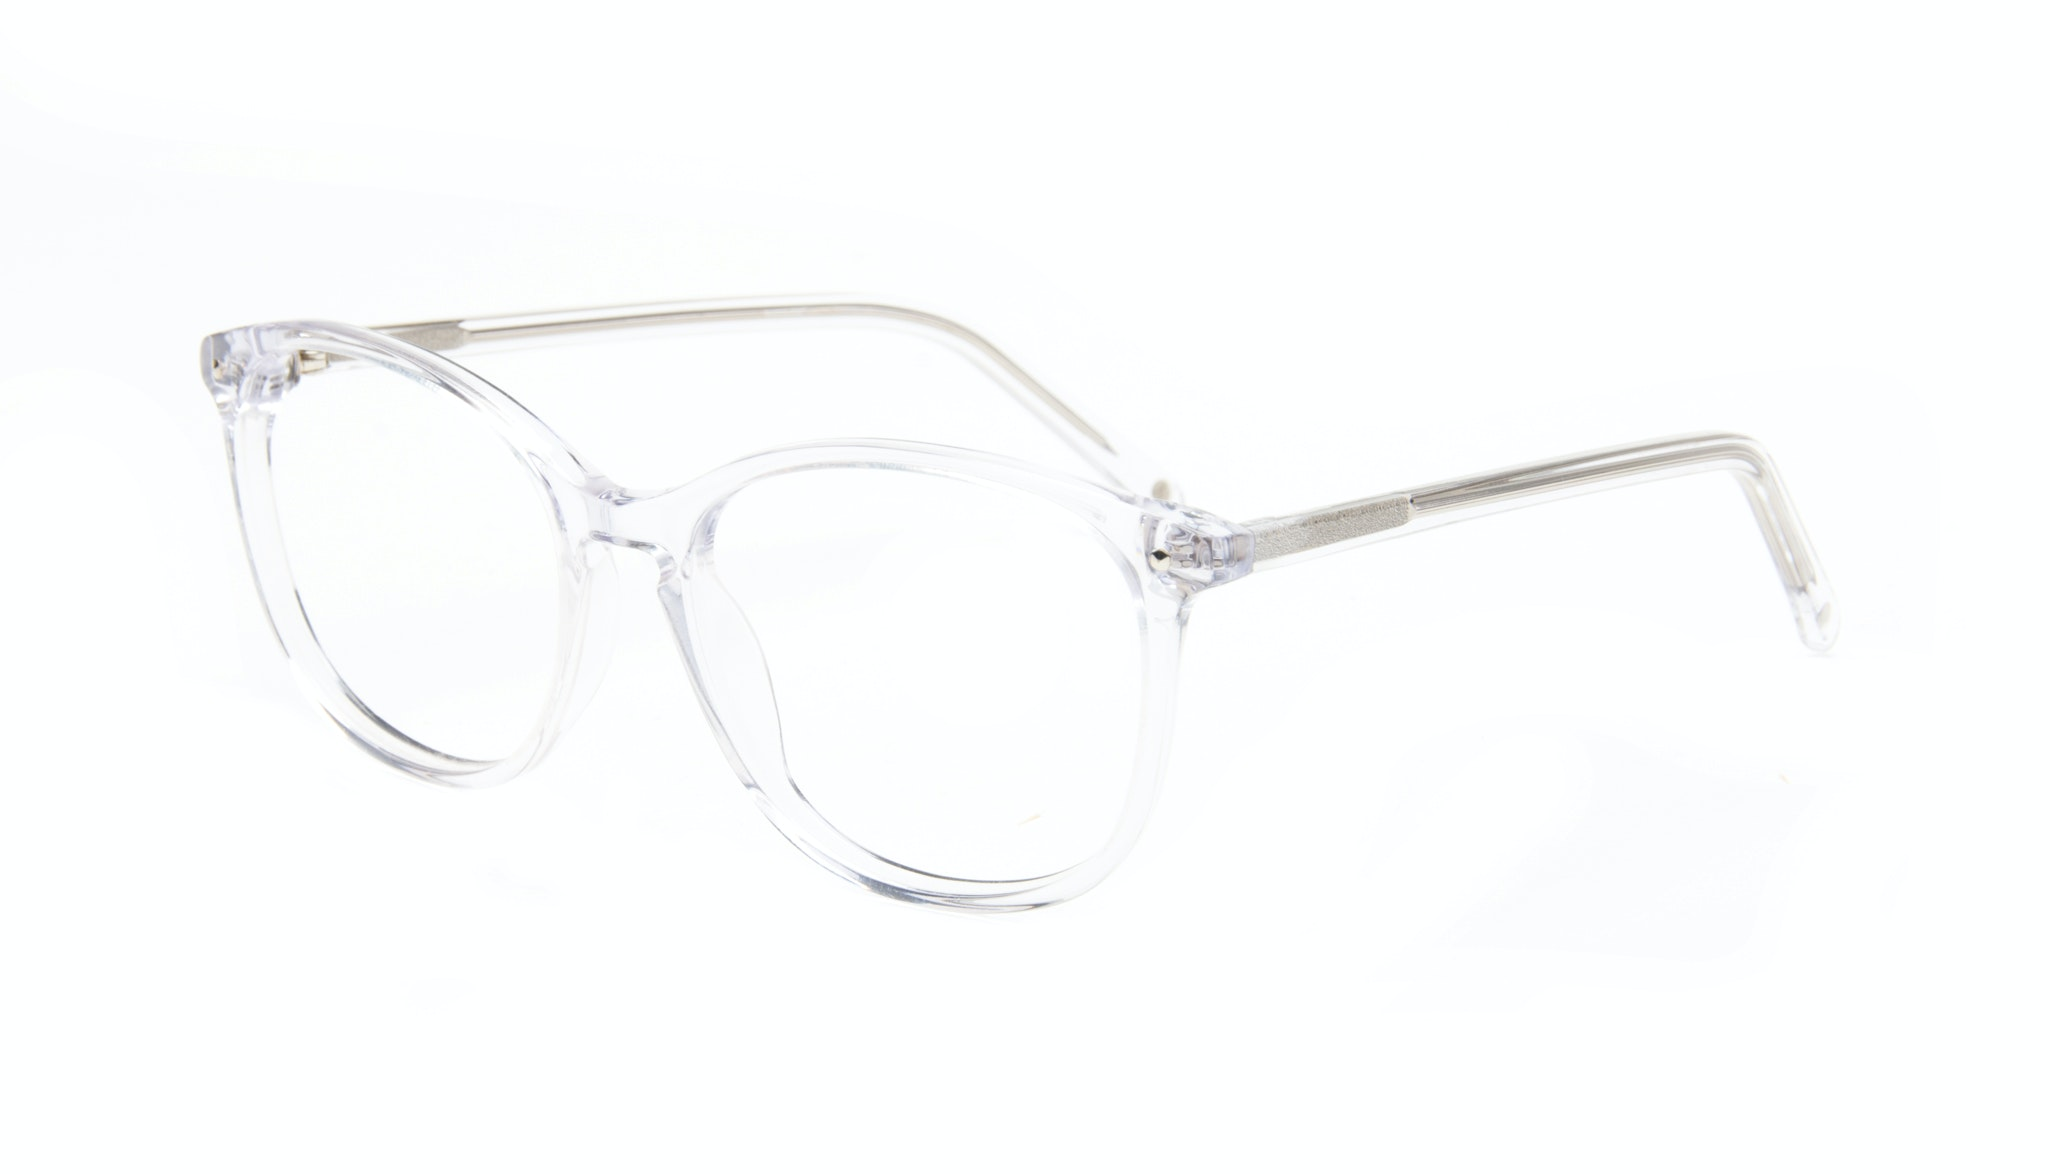 Affordable Fashion Glasses Rectangle Square Round Eyeglasses Women Nadine Water Tilt